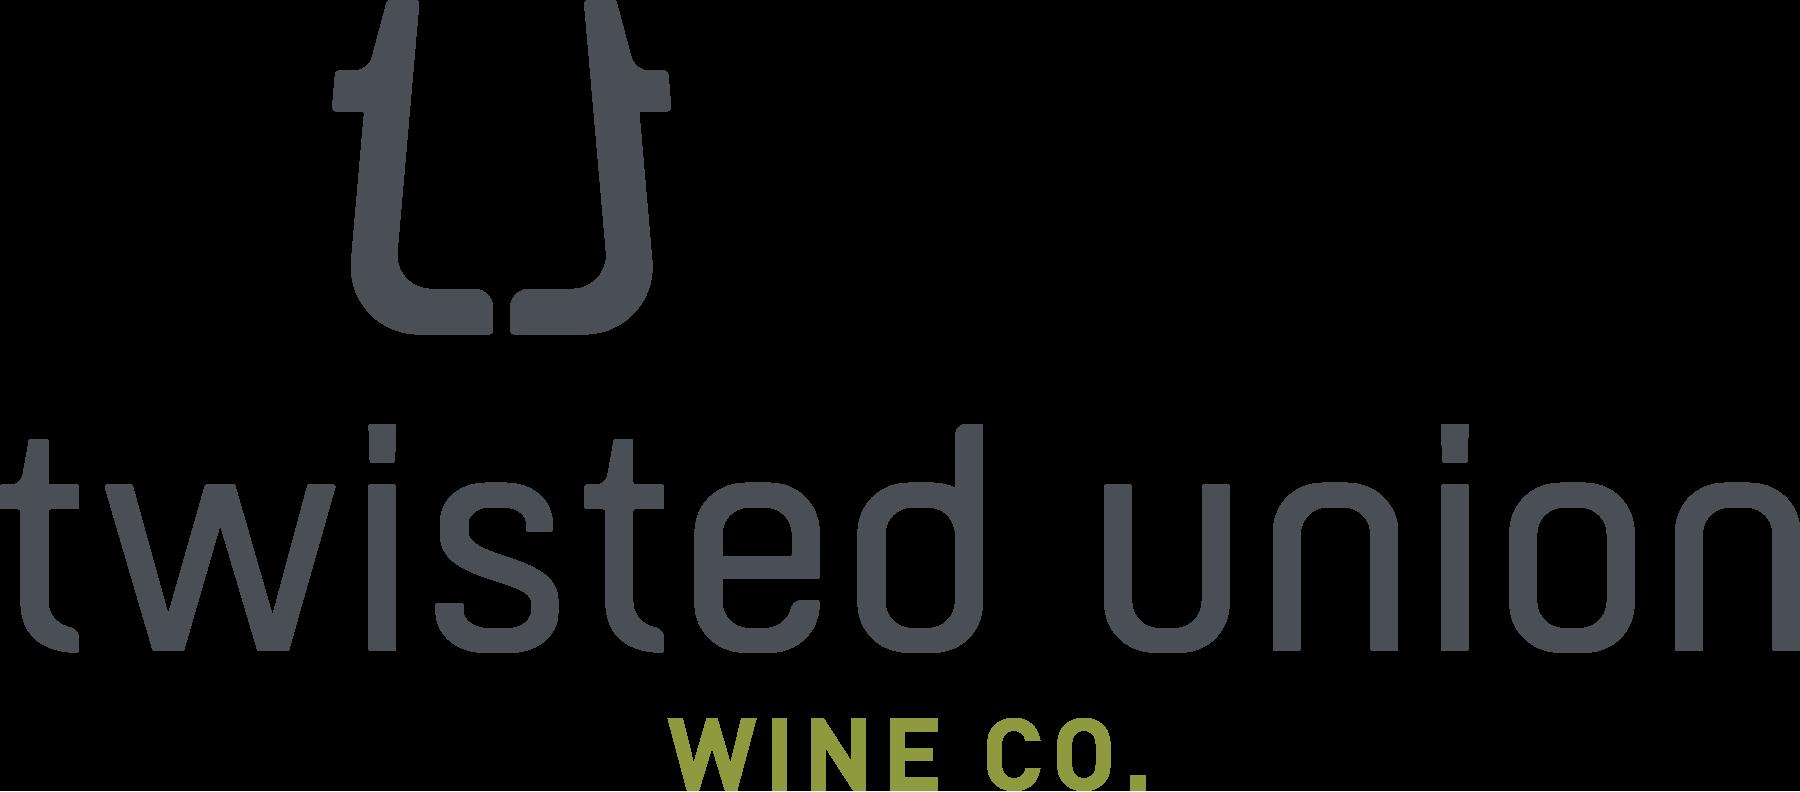 Twisted Union Wine Company